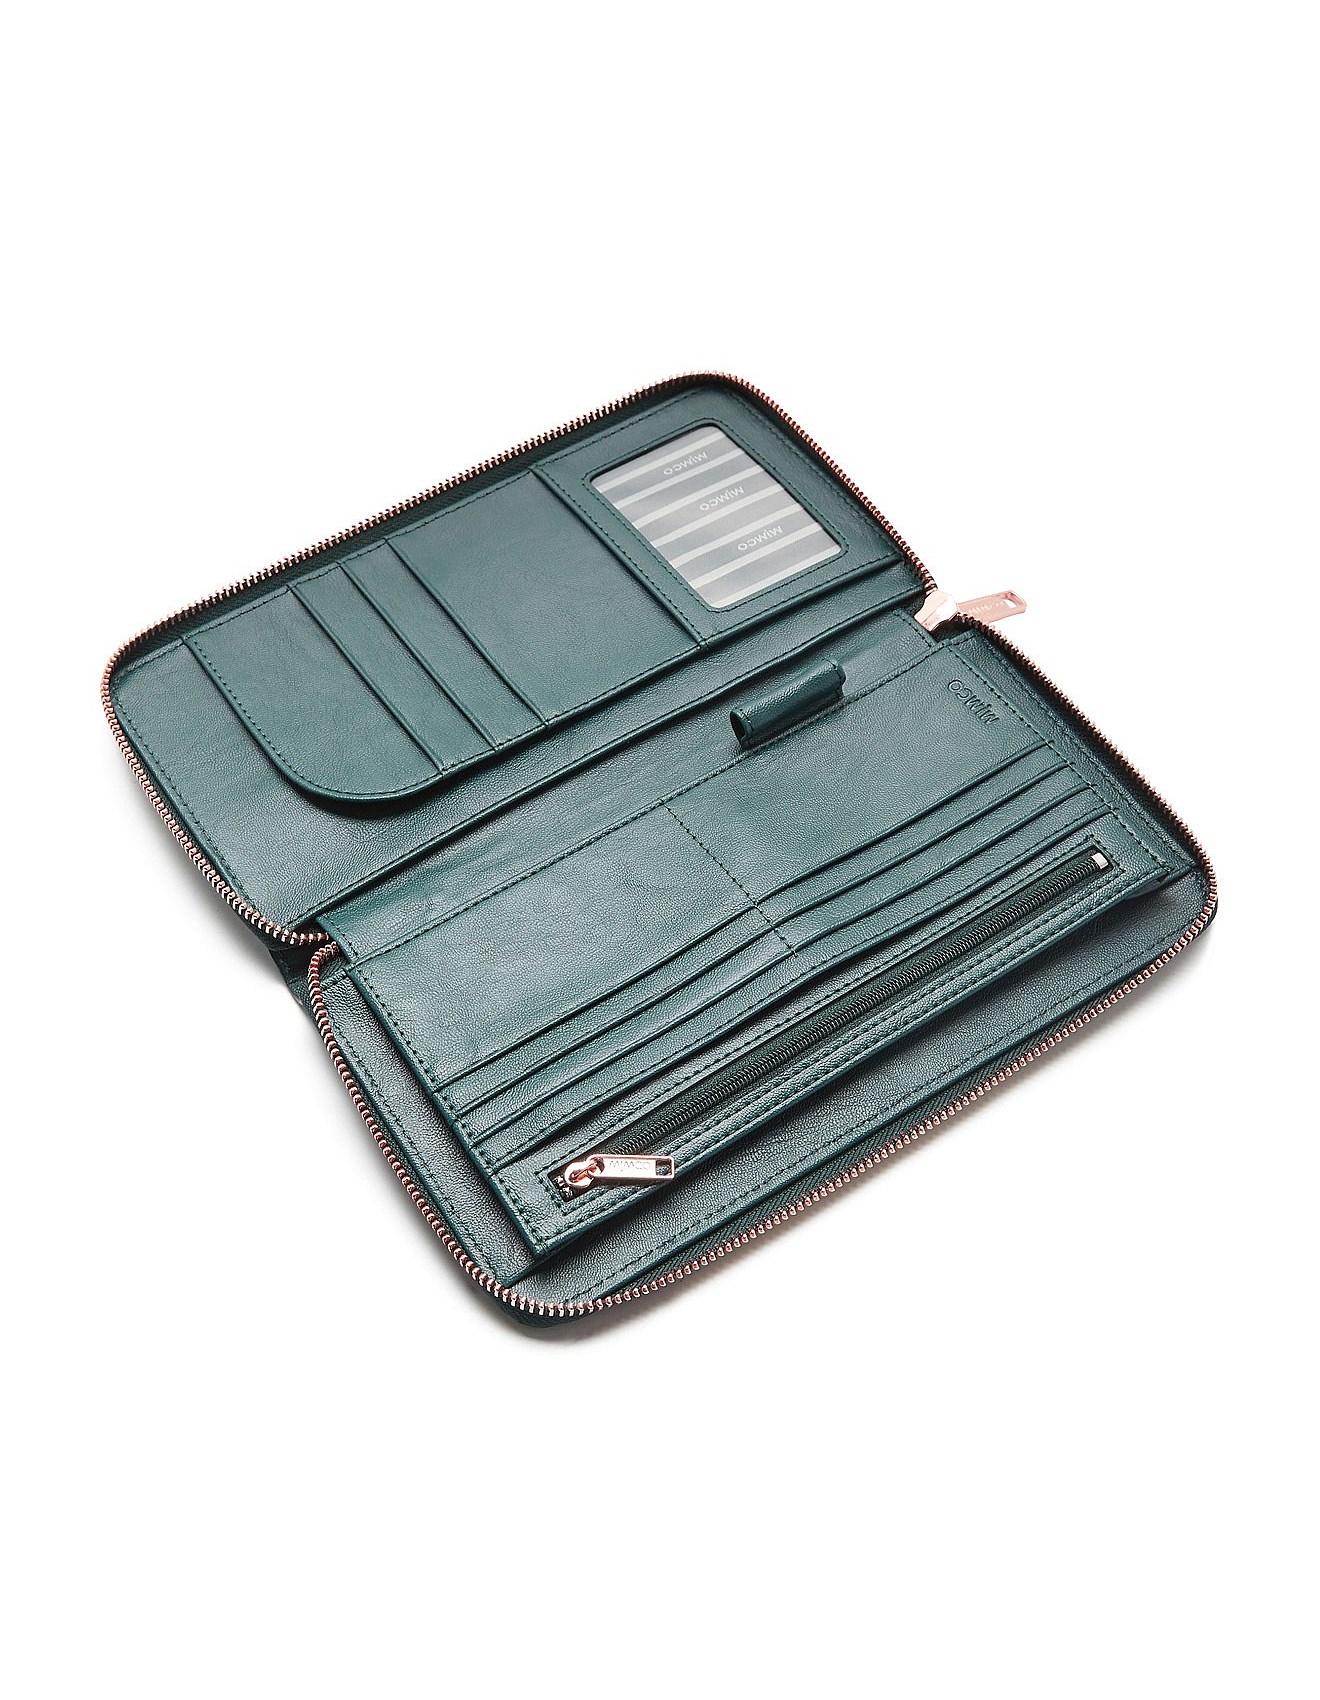 Mimco Travel Wallet Sale